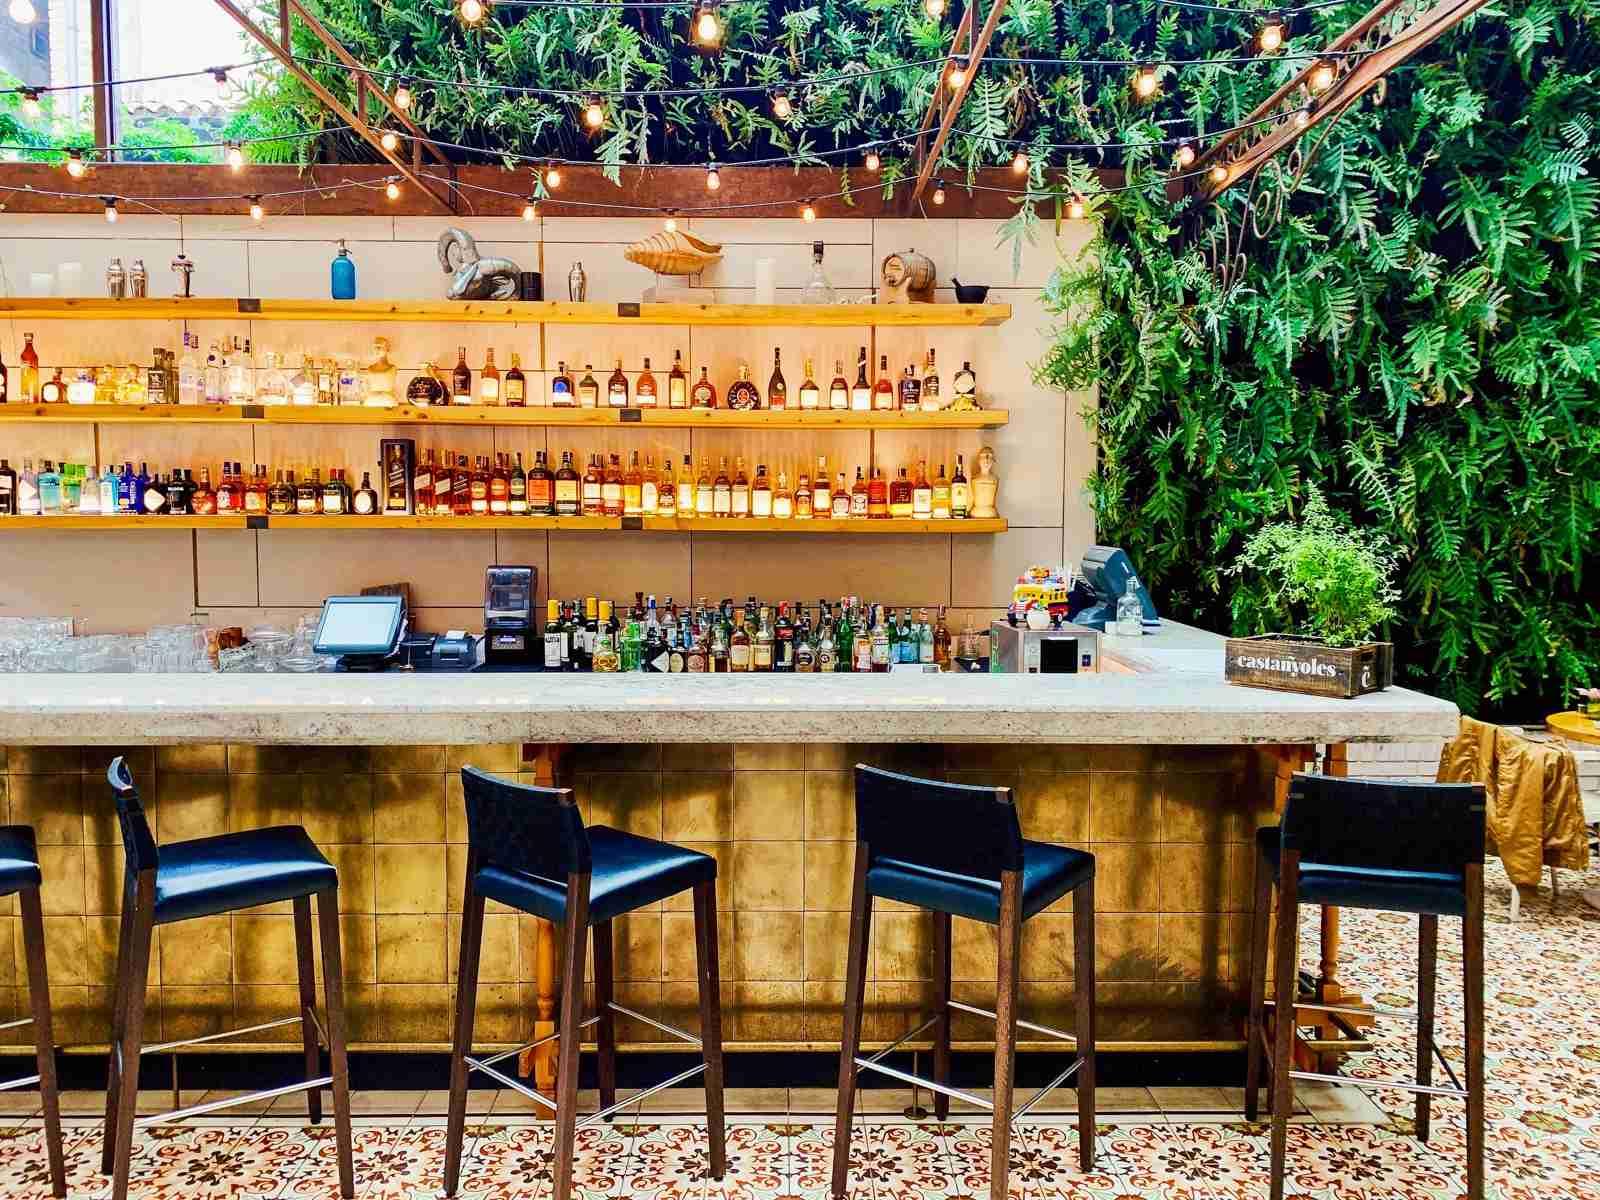 The gorgeous Castañyoles bar at the Four Seasons Bogotá. (Photo by Nick Ellis / The Points Guy)